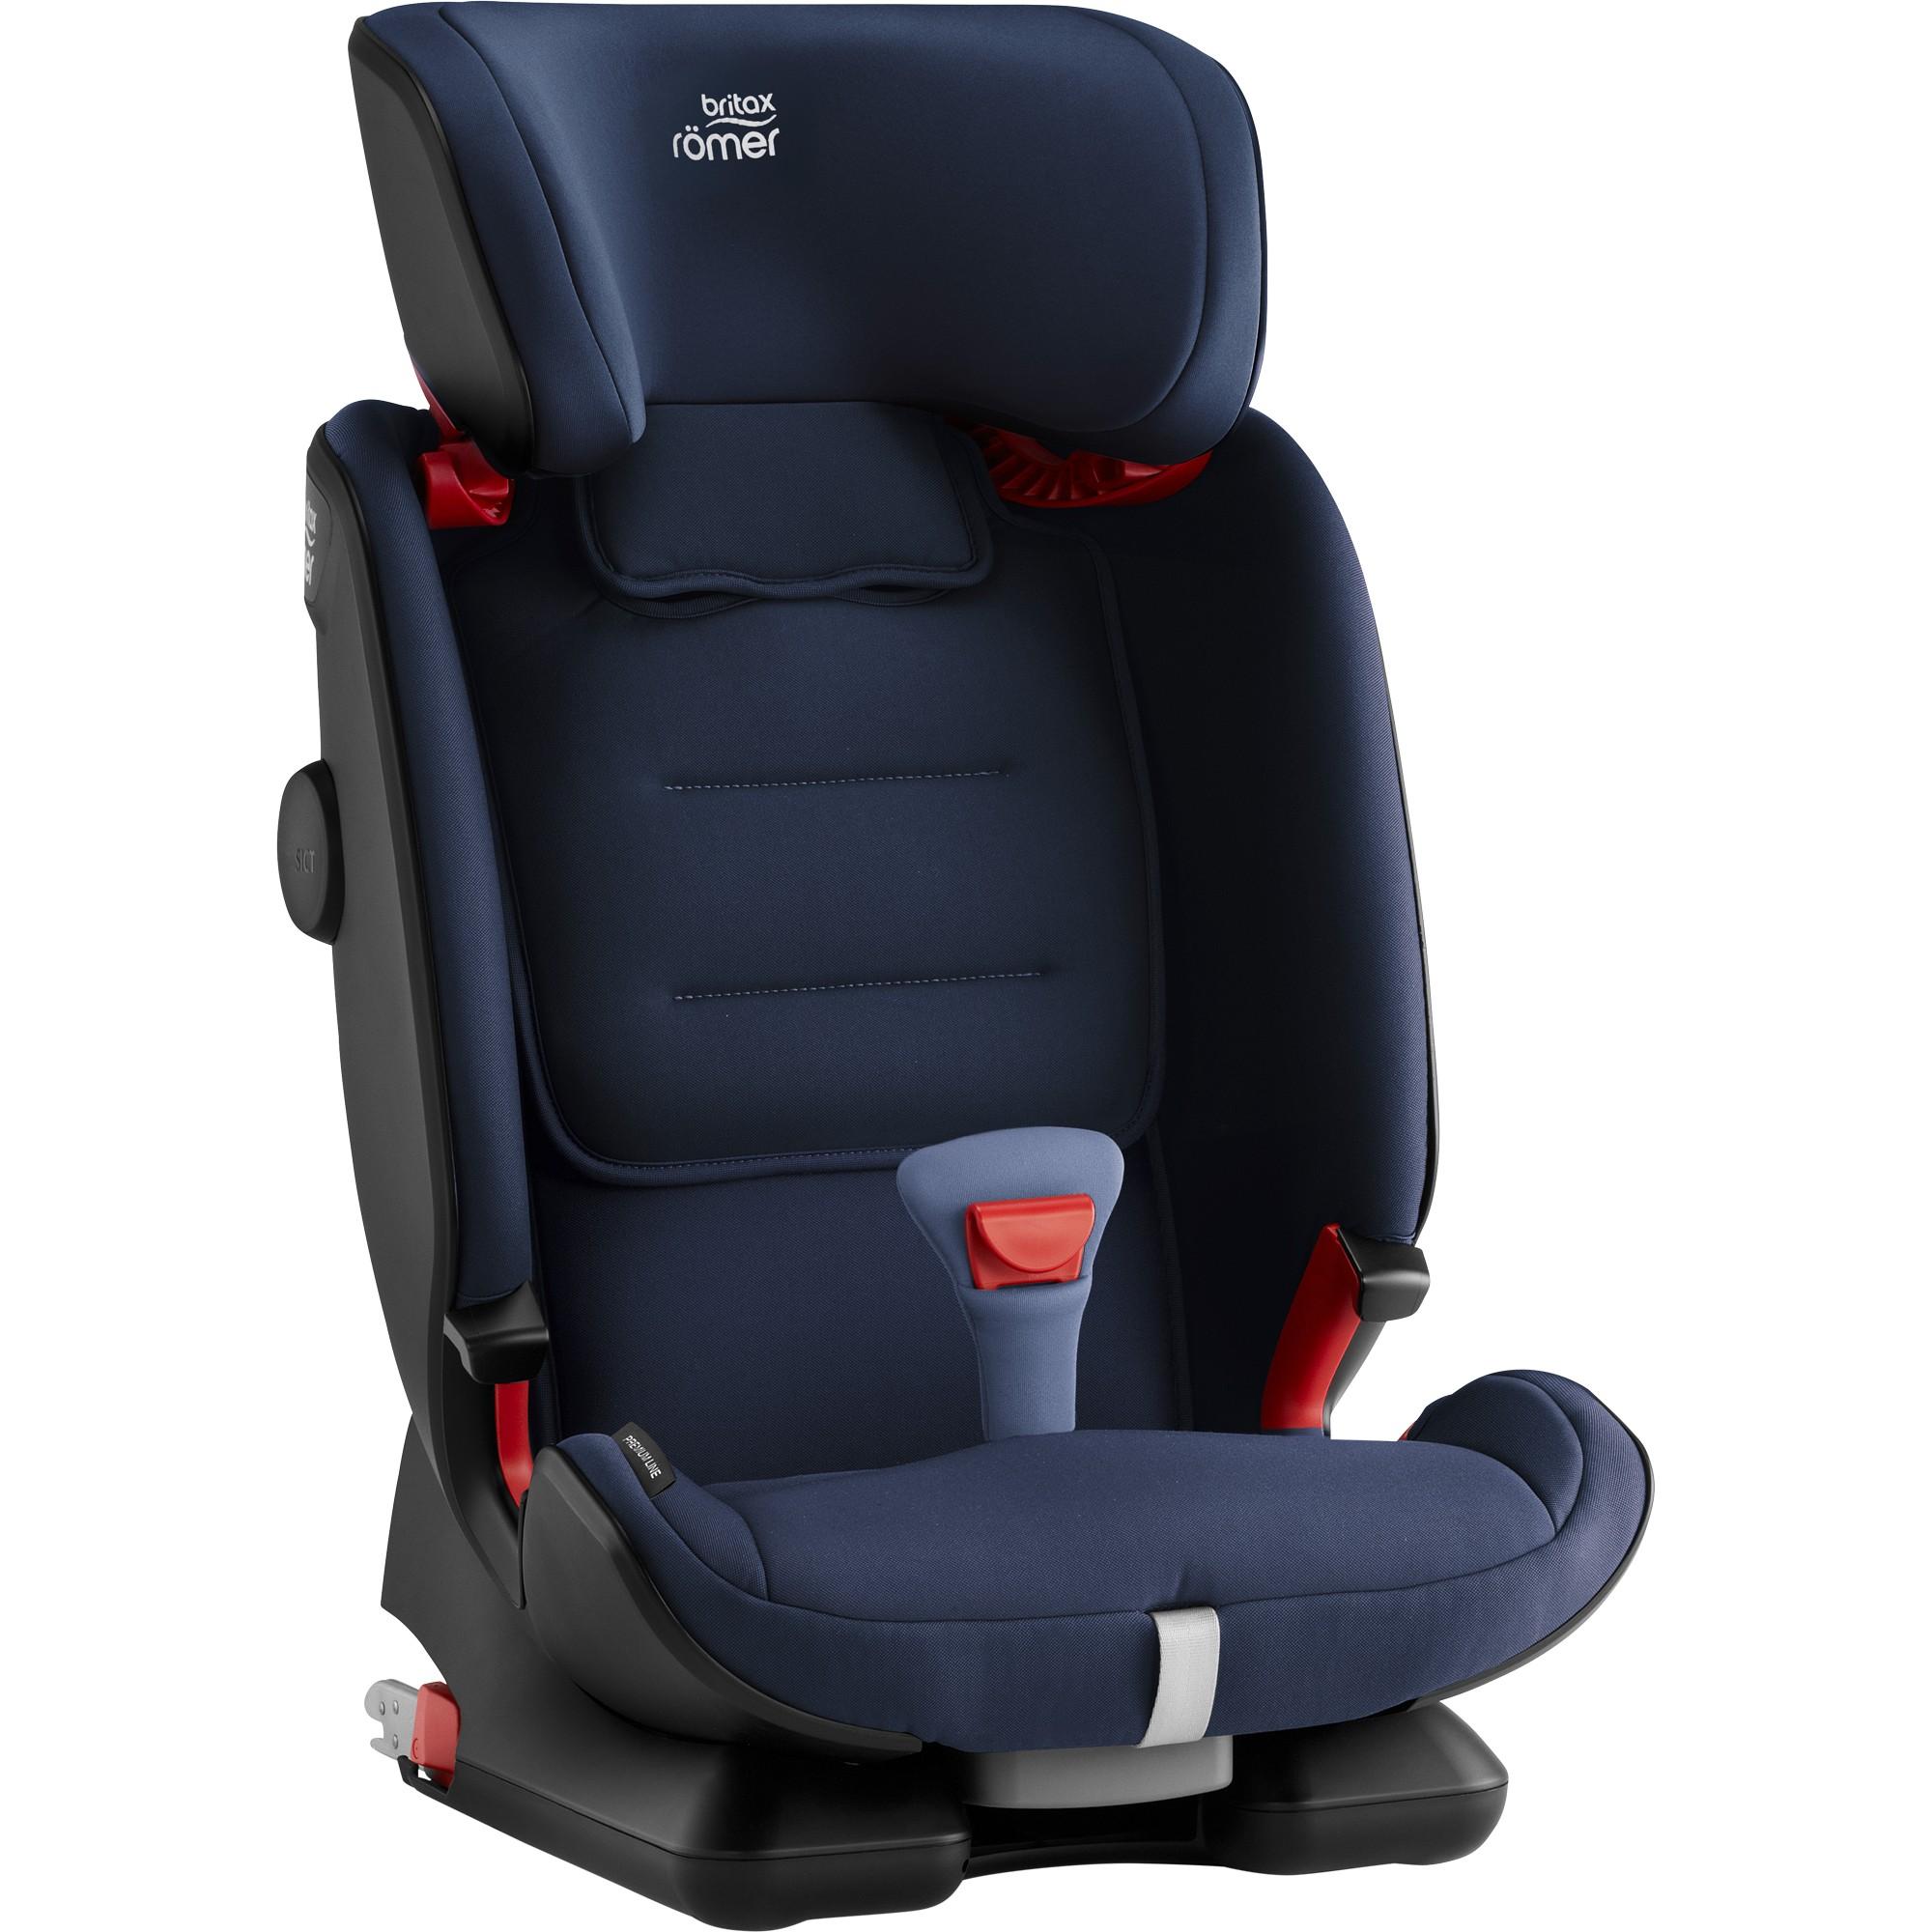 Britax-Romer-ADVANSAFIX-IV-R-Group-1-2-3-Child-Car-Seat thumbnail 9